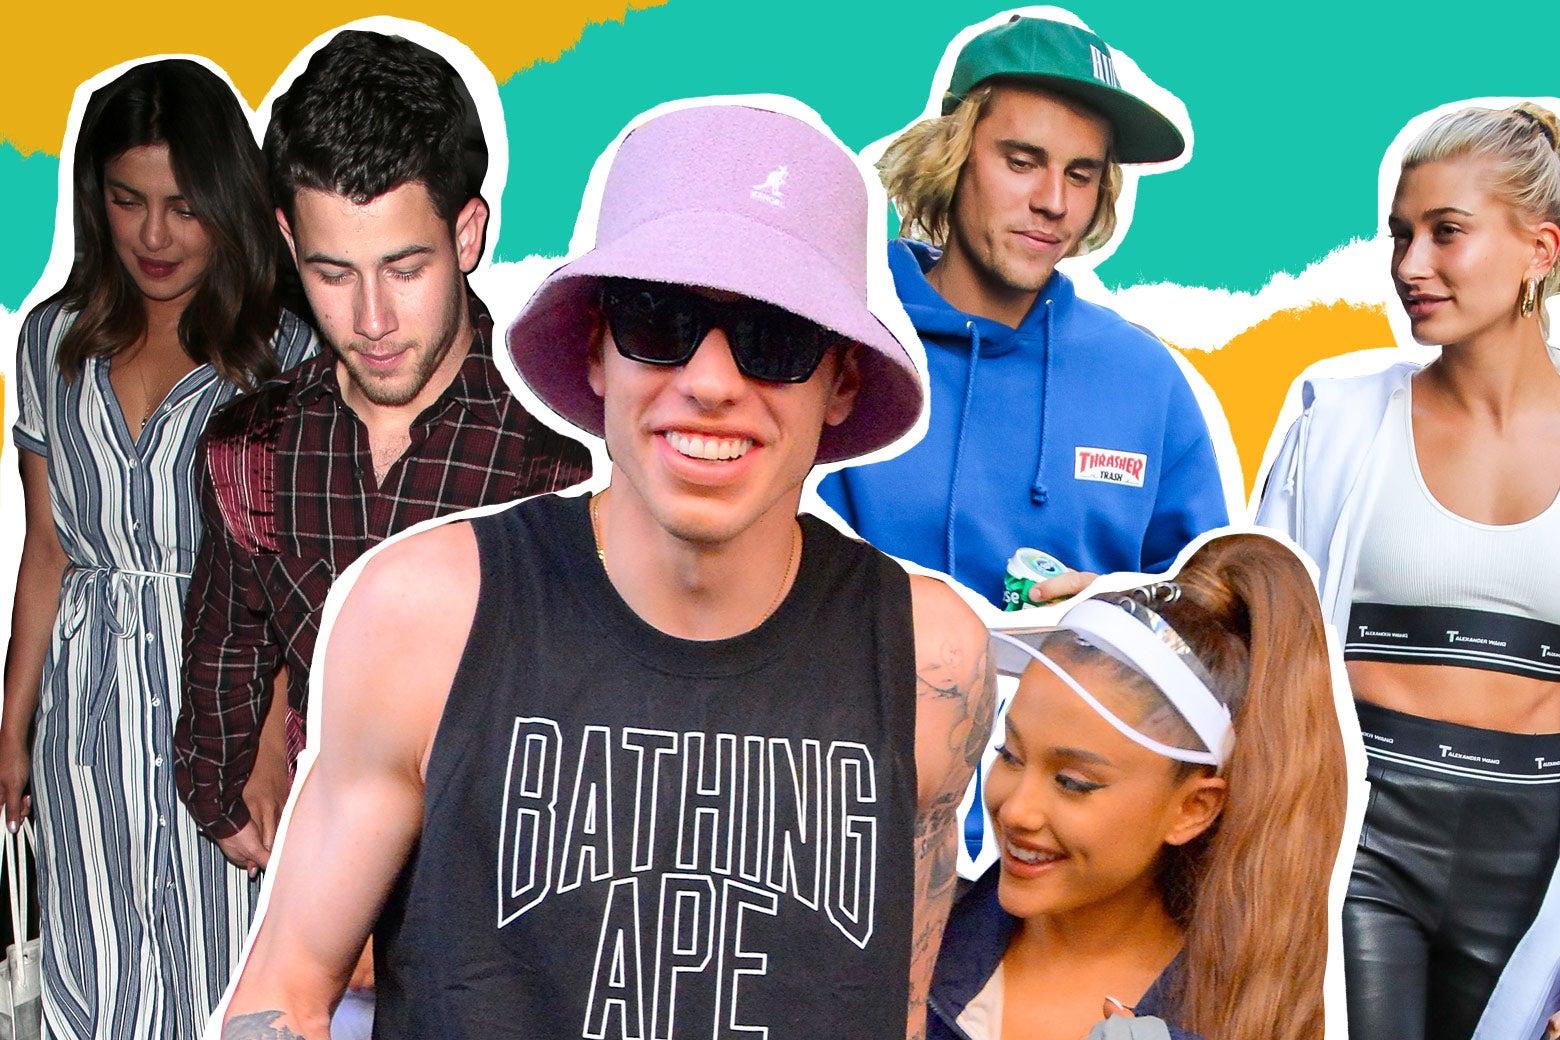 Nick Jonas and Priyanka Chopra, Pete Davidson and Ariana Grande, and Justin Bieber and Hailey Baldwin.